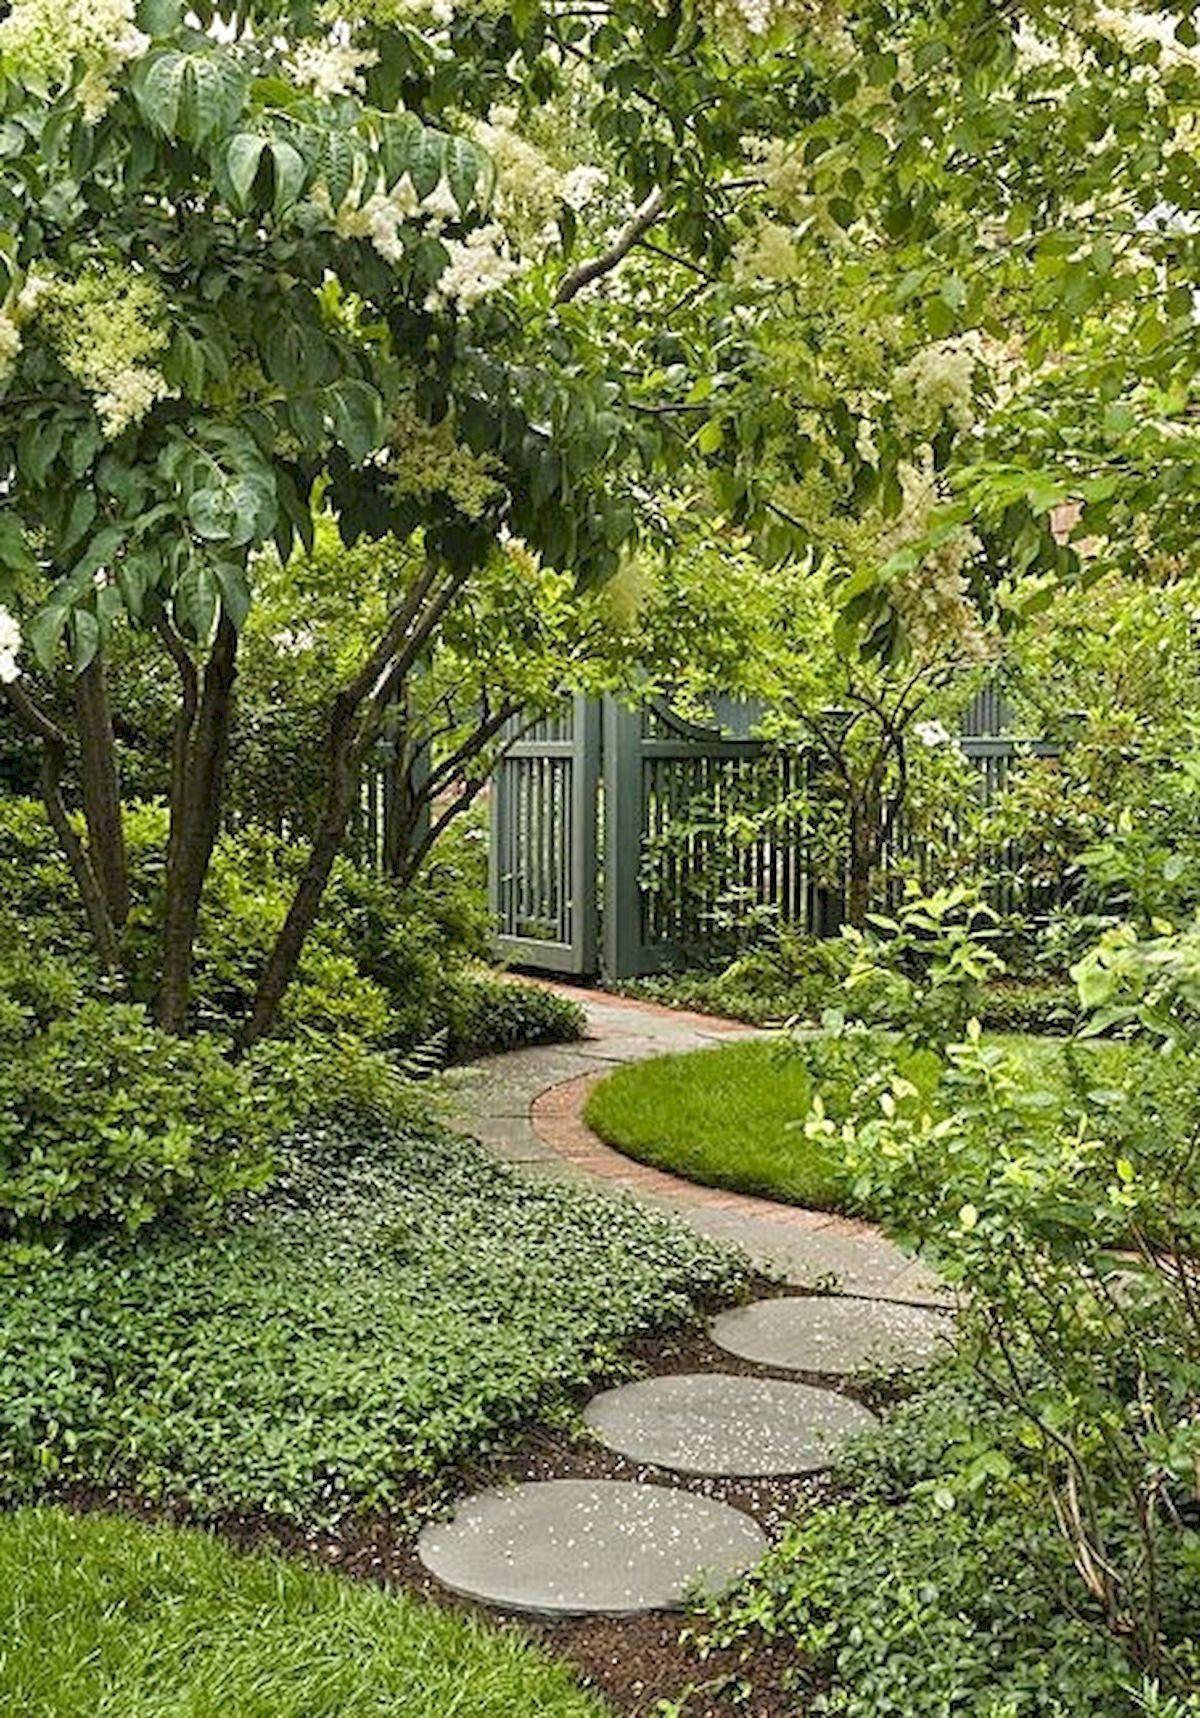 60 Favourite Garden Design Ideas For Making Your Page Beautiful Home Garden Cottage Garden Design Small Garden Design Beautiful Backyards